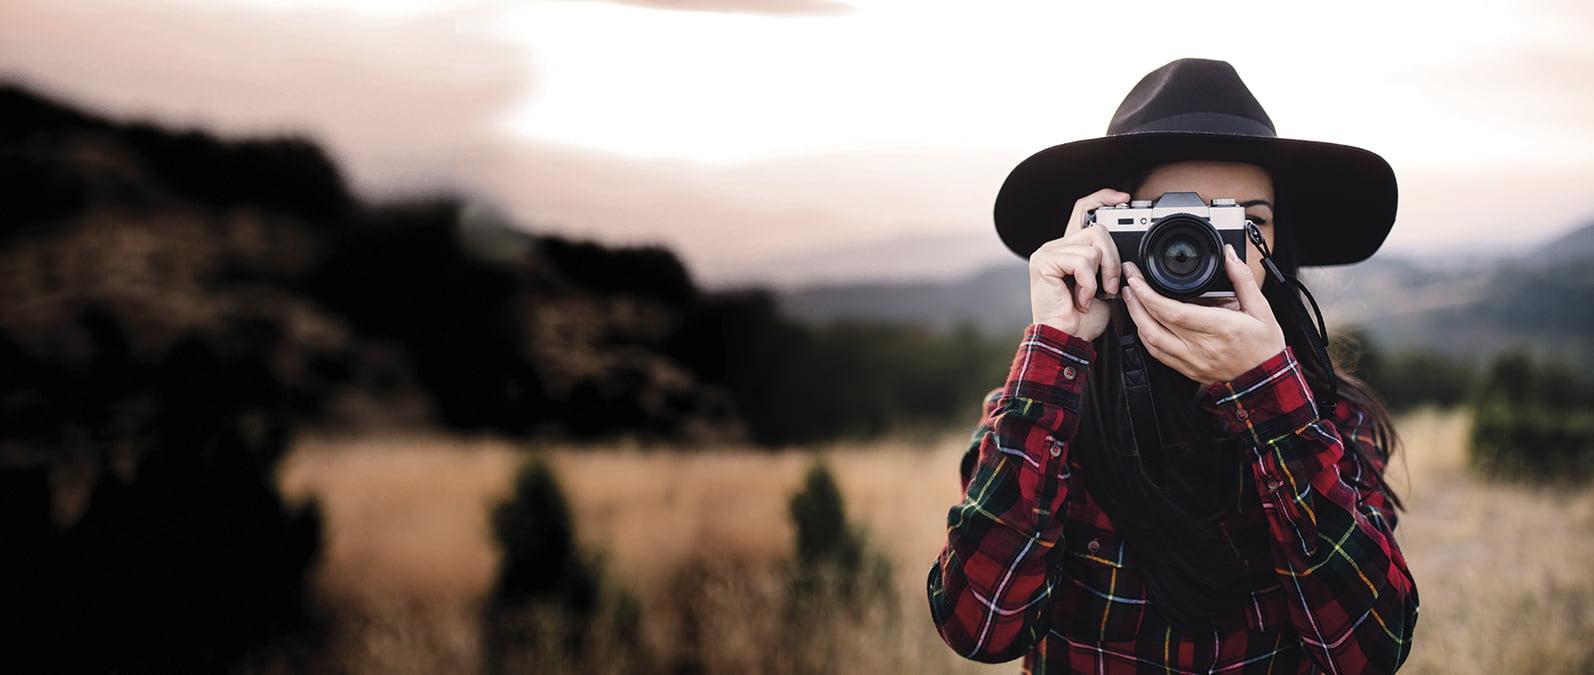 belajar fotografi otodidak